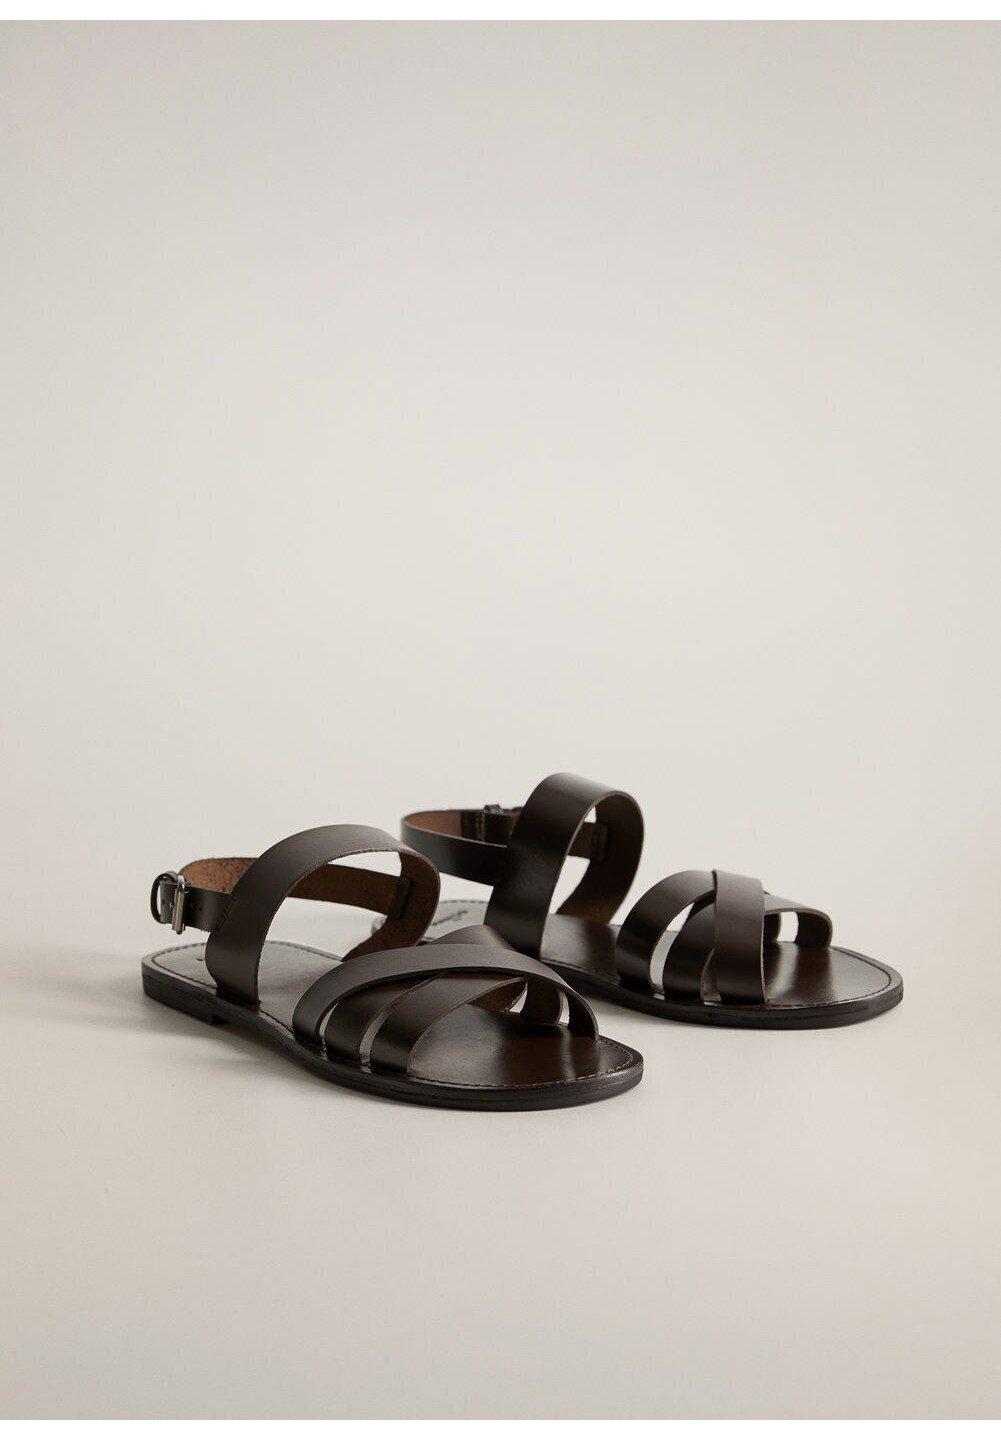 Handle Ind Fabrikspris Herresko Mango MALLORCA Sandaler chocolate o87yJ5 waYHDX